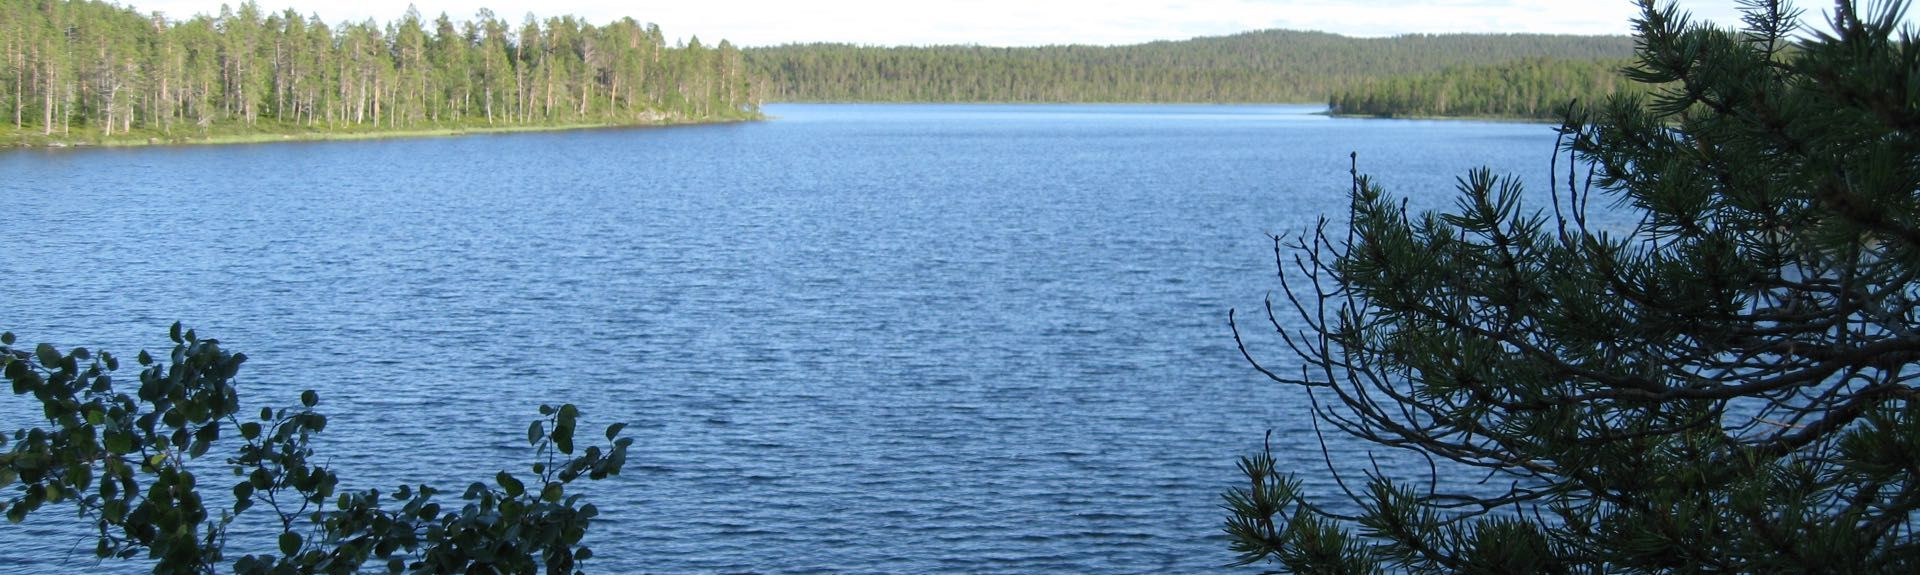 Siida, Inari, Lapland, Finland